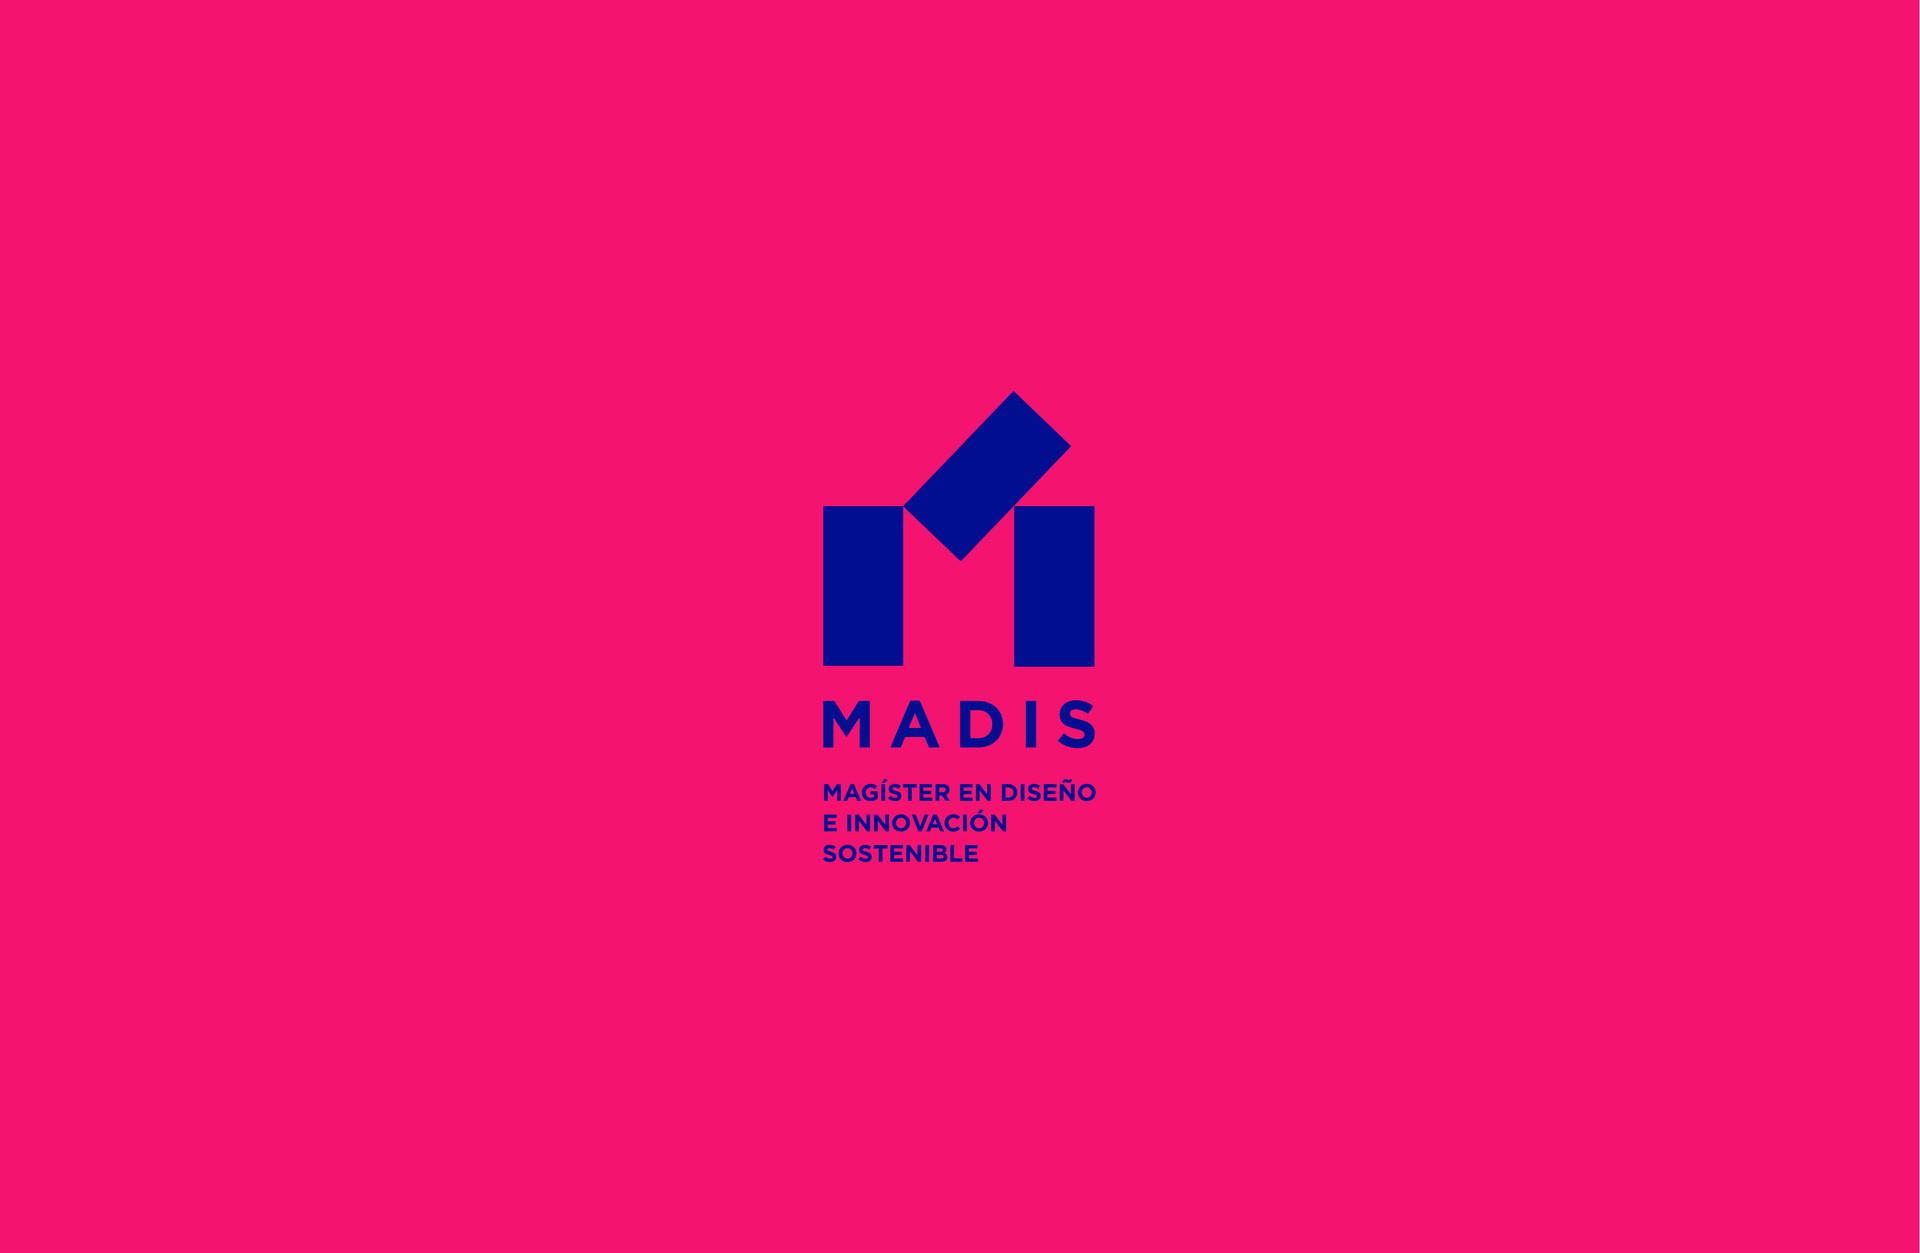 MADIS_FINAL-01.jpg